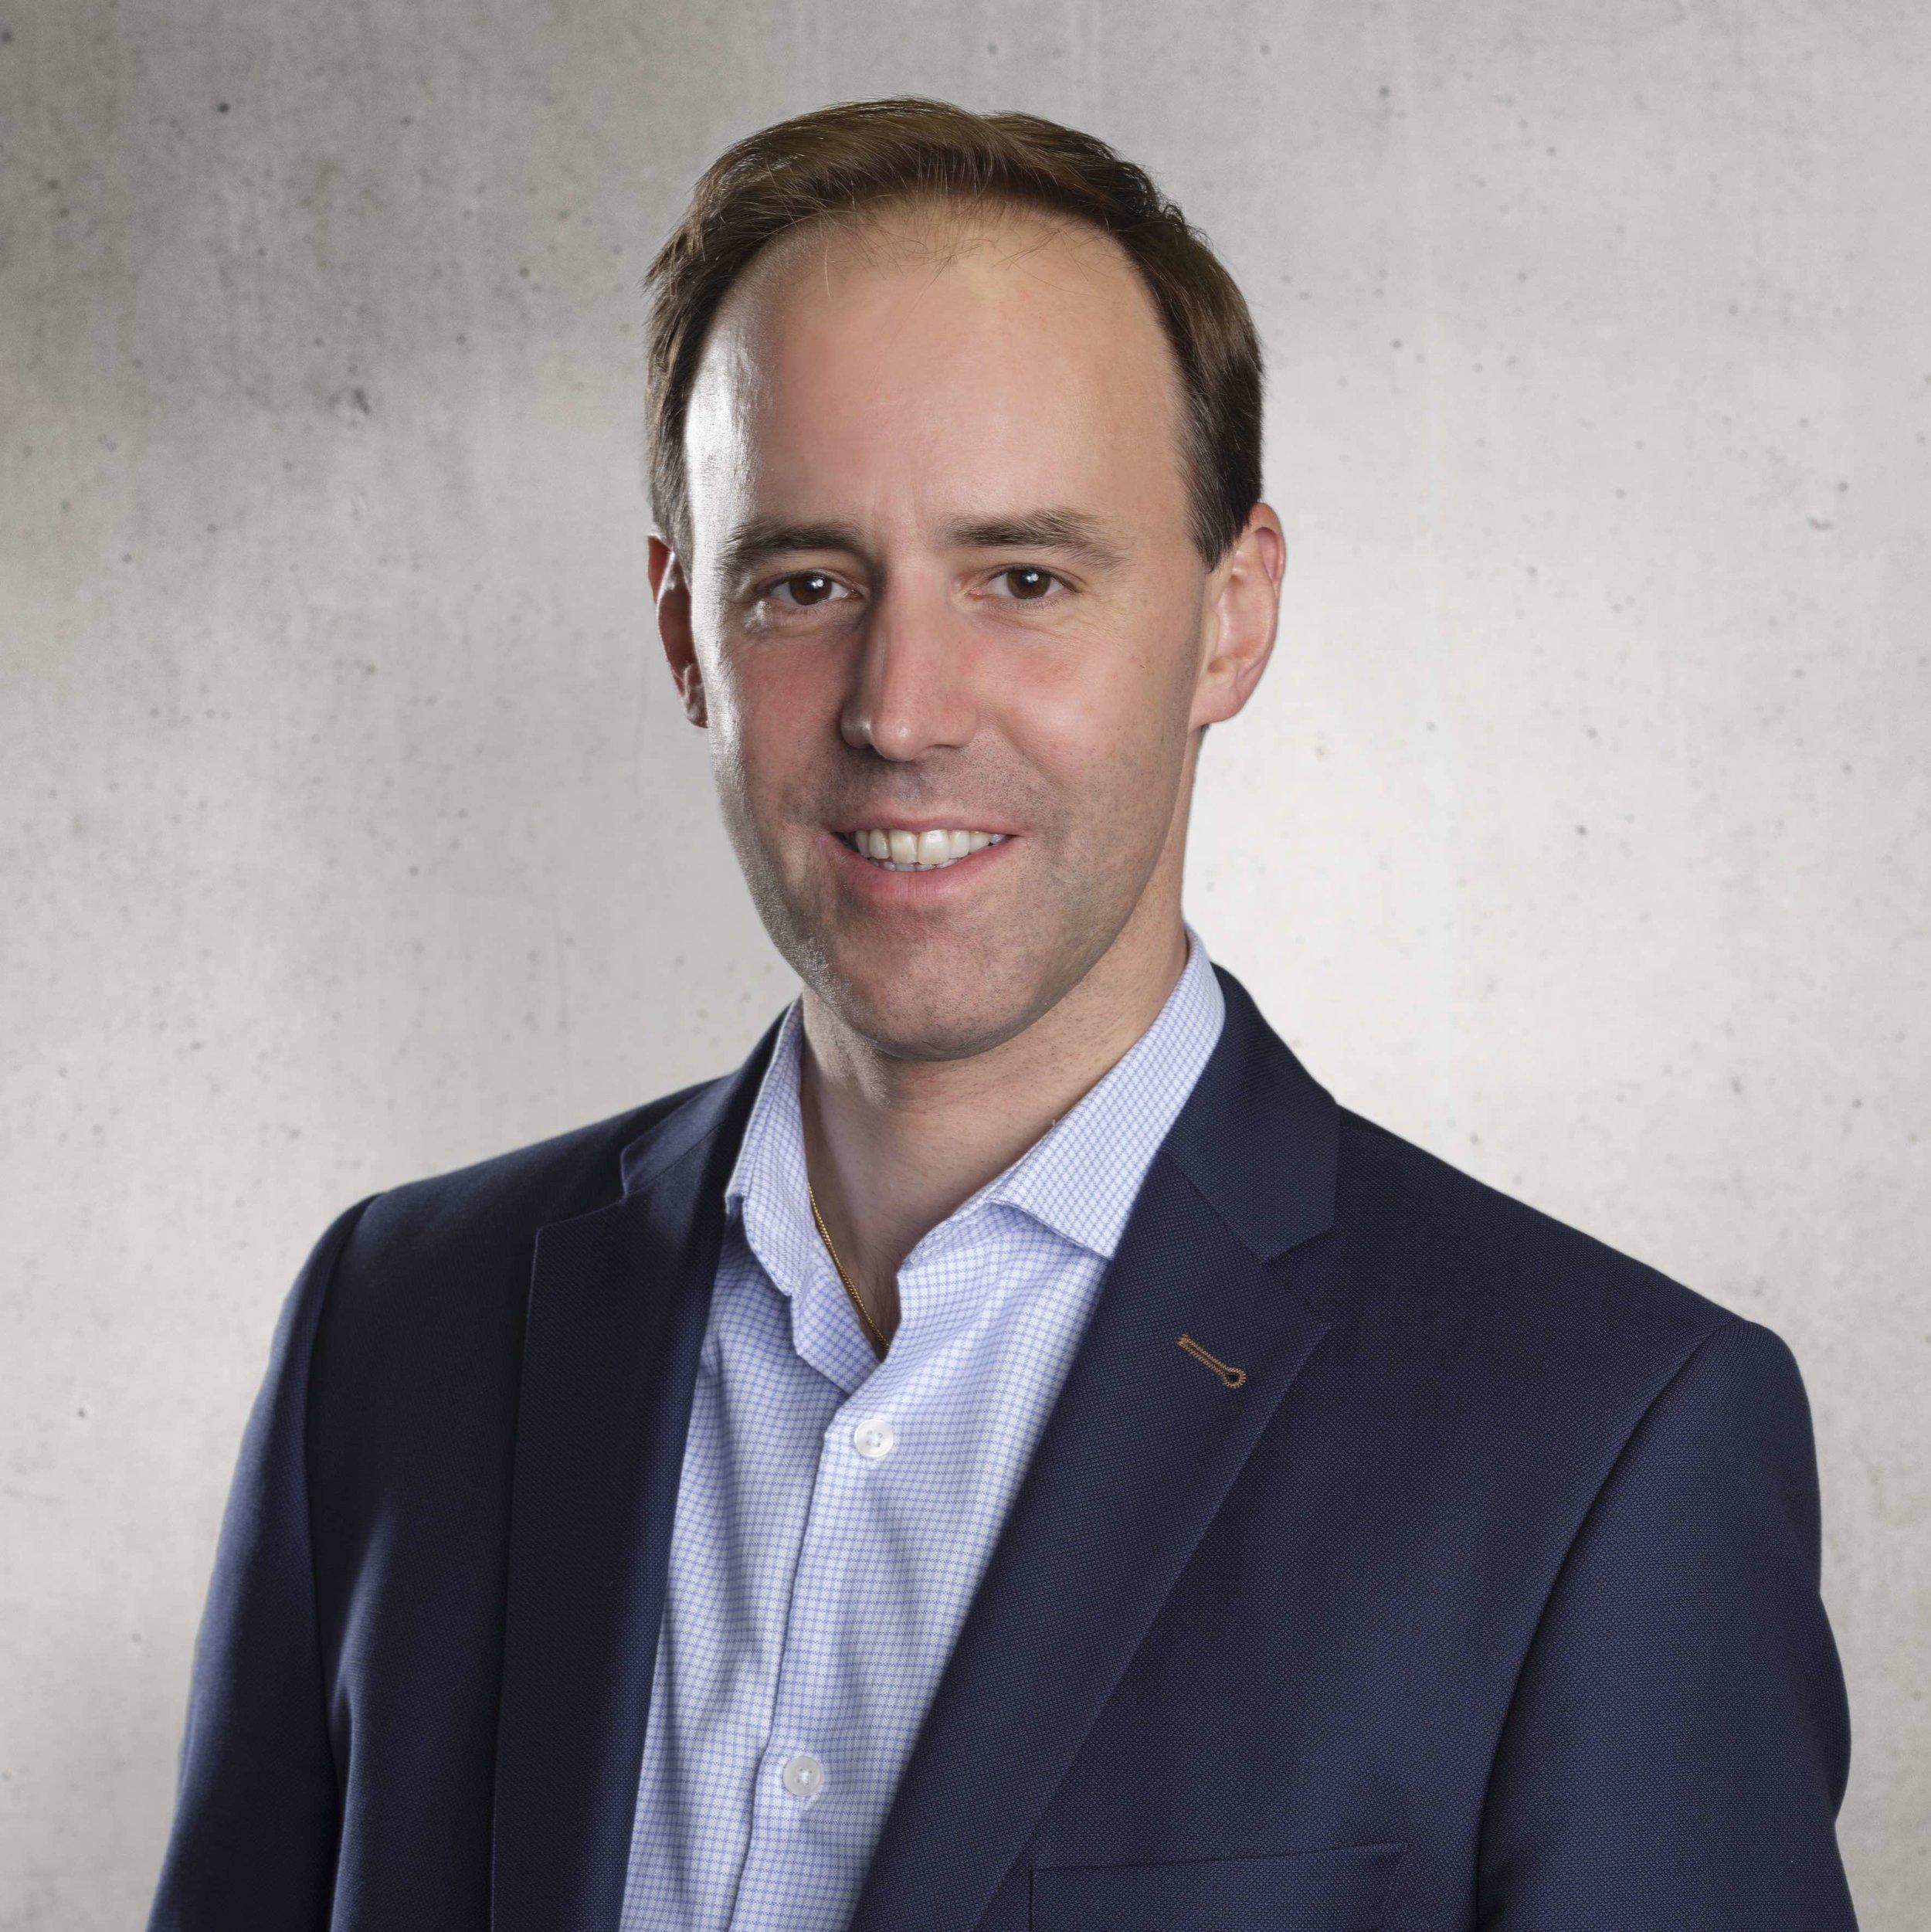 Eric Barthe, Partner - Head of Financial Engineeringemail: eric.barthe@anovapartners.com direct no.: +41 44 215 24 78